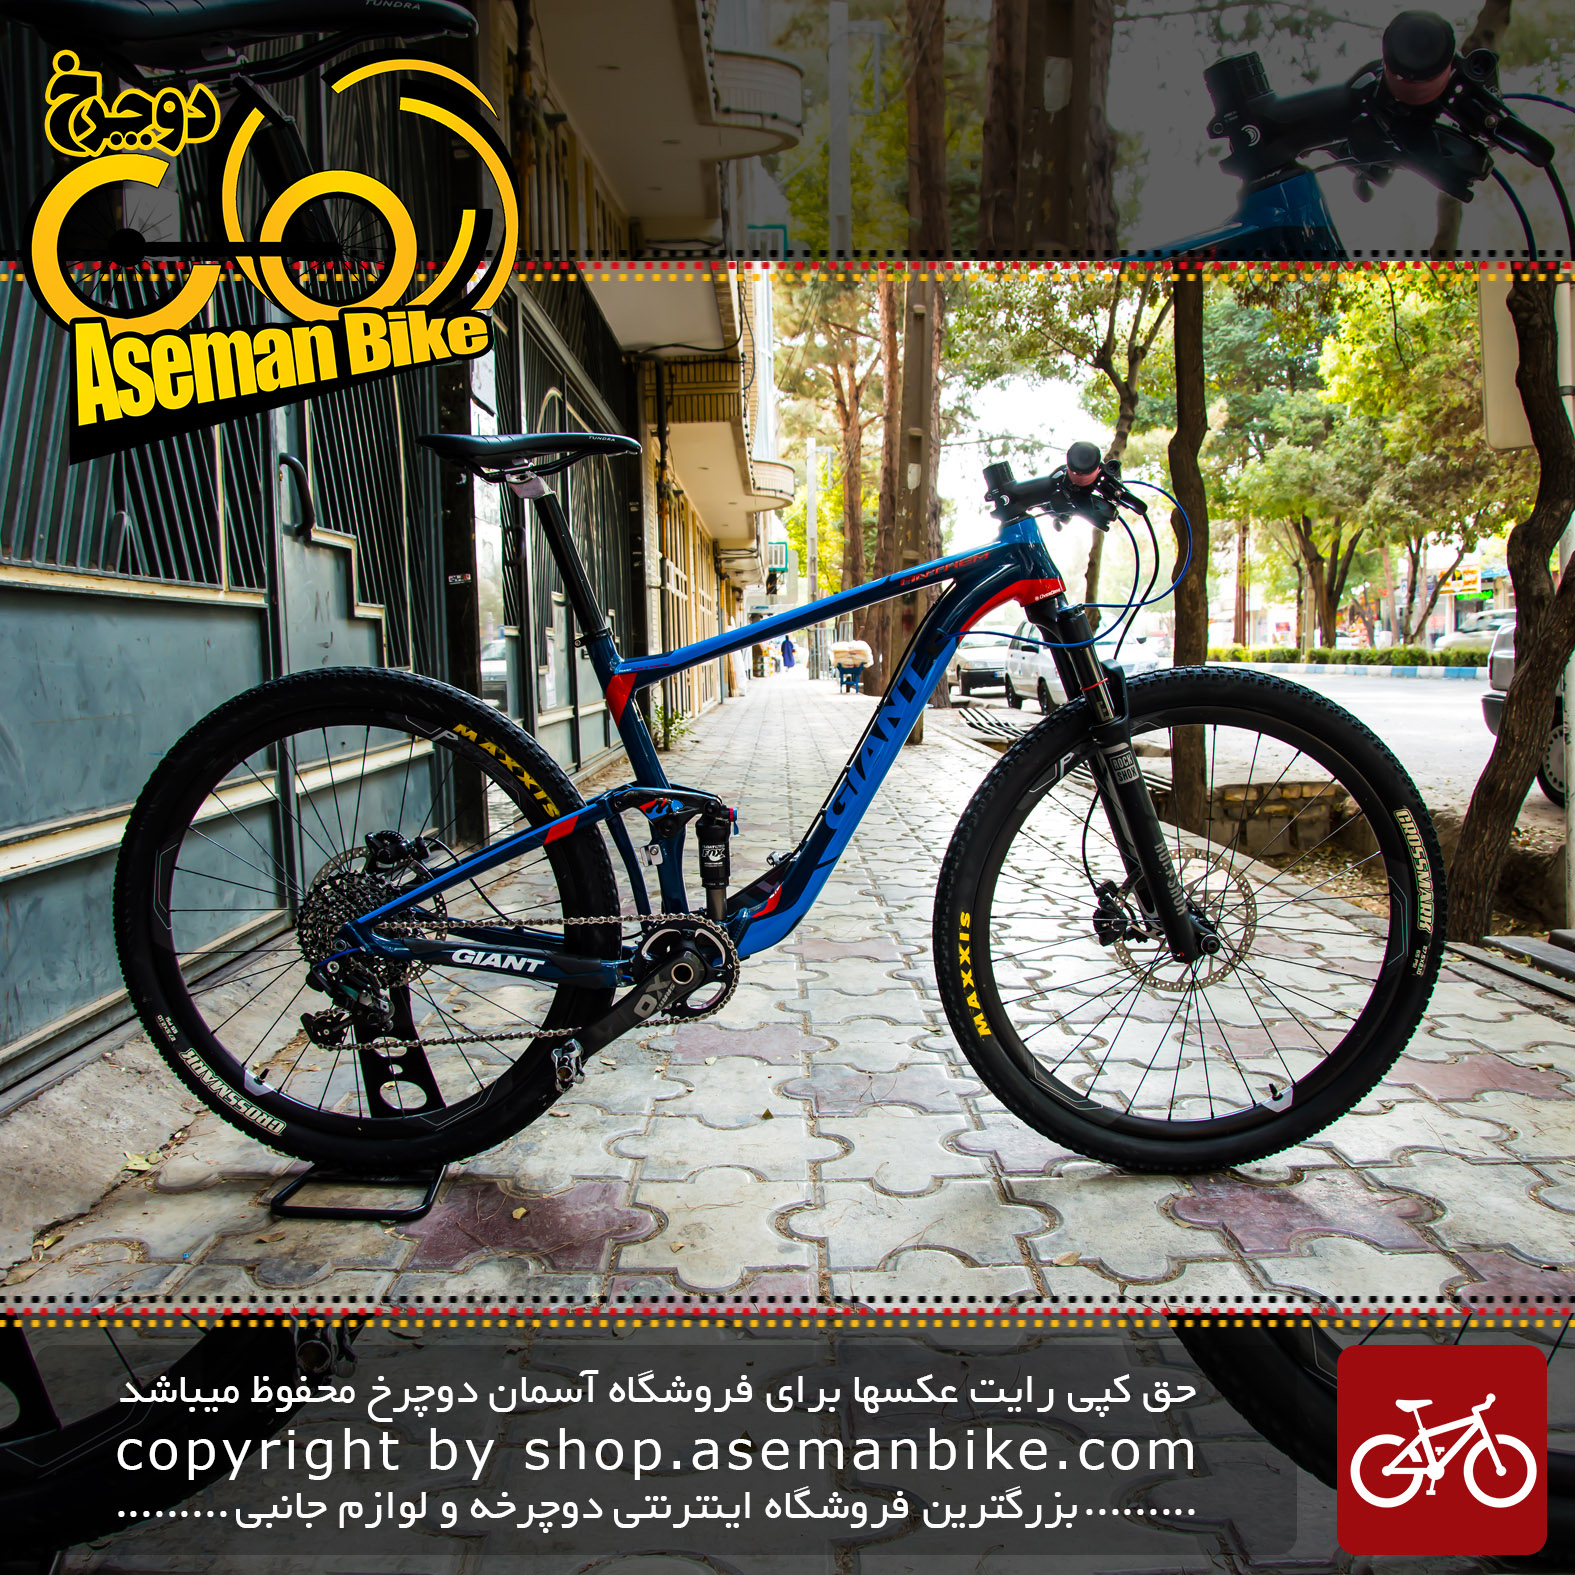 دوچرخه کوهستان جاینت مدل انتم ایکس 0 دست دوم 2012 Giant Mountain Bicycle Anthem X 0 2012